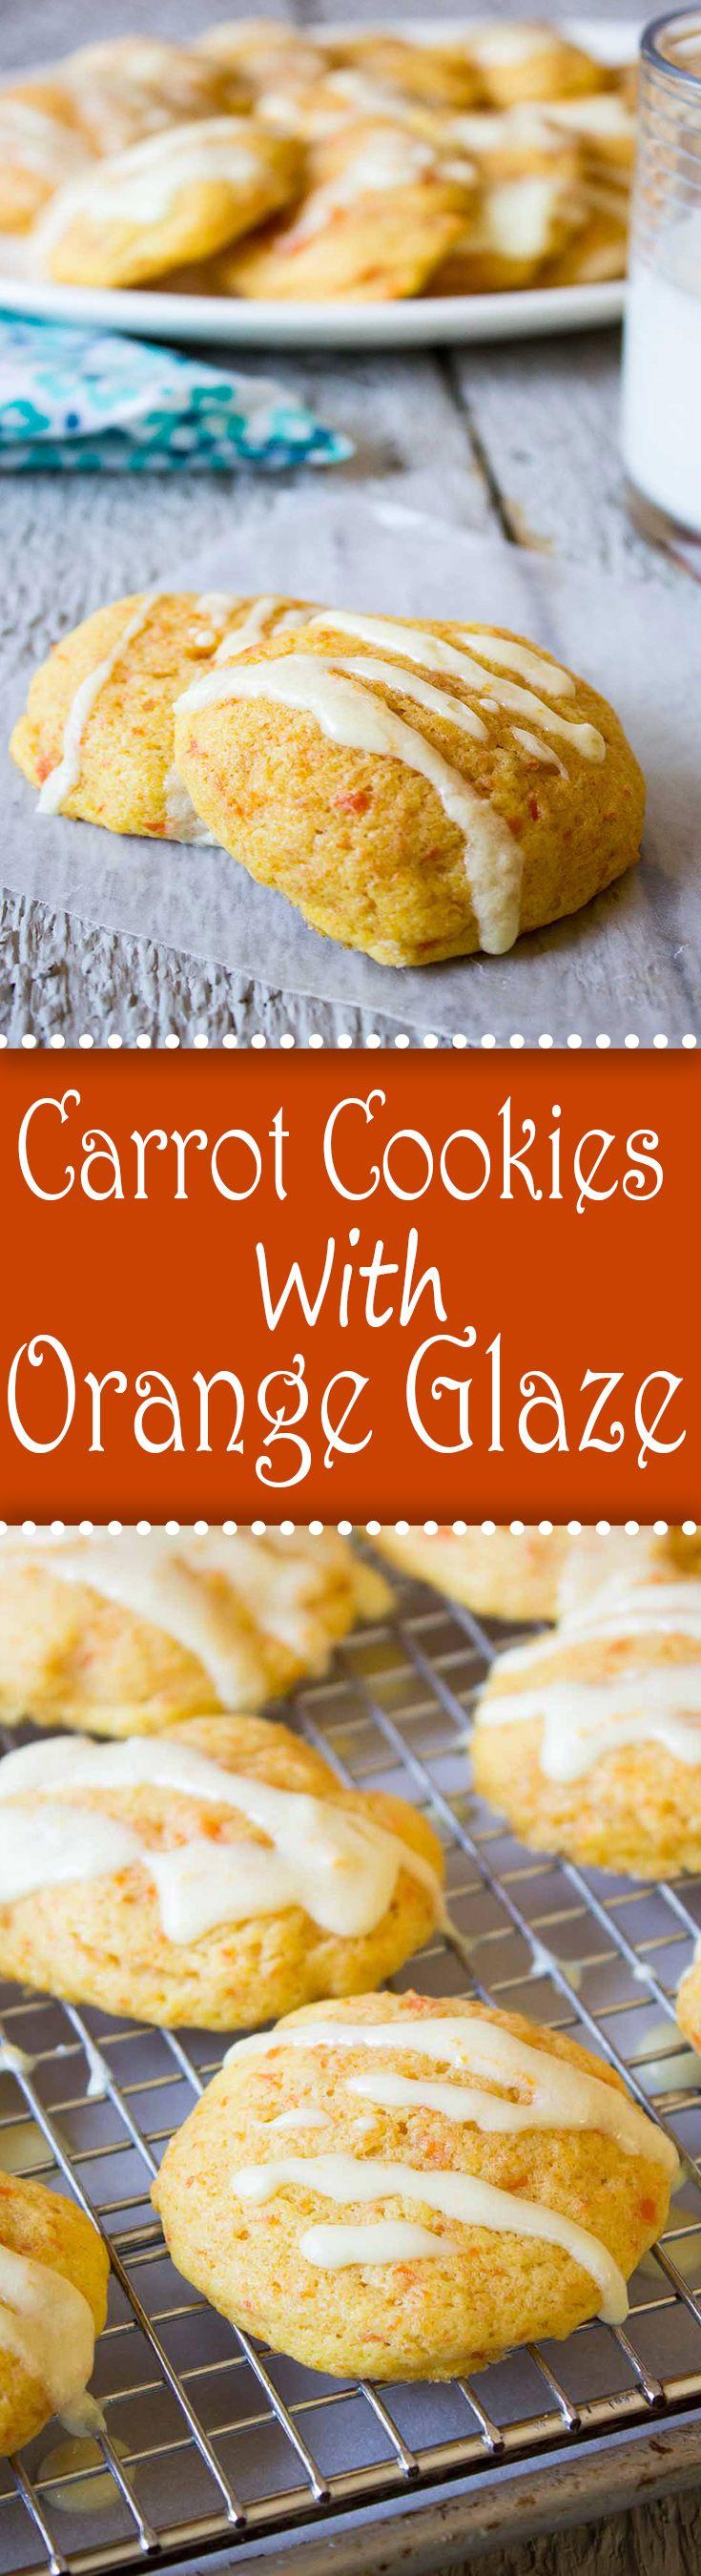 Carrot Cookies with Orange Glaze.